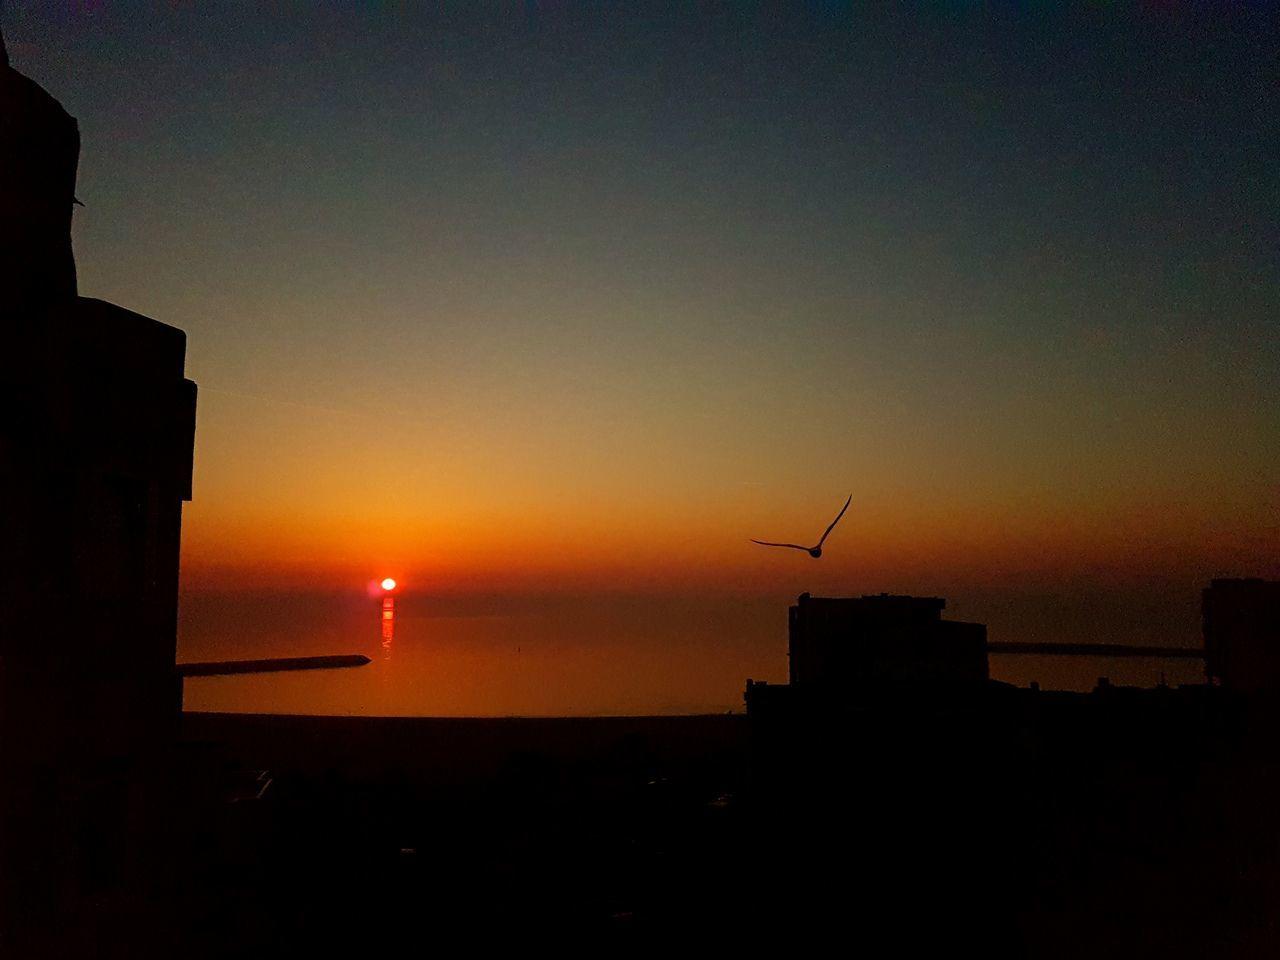 No Filter Sky Sunrire Sunshine Sun Sunshine ☀ Sea Bird Noedit Taking Photos Perfectview